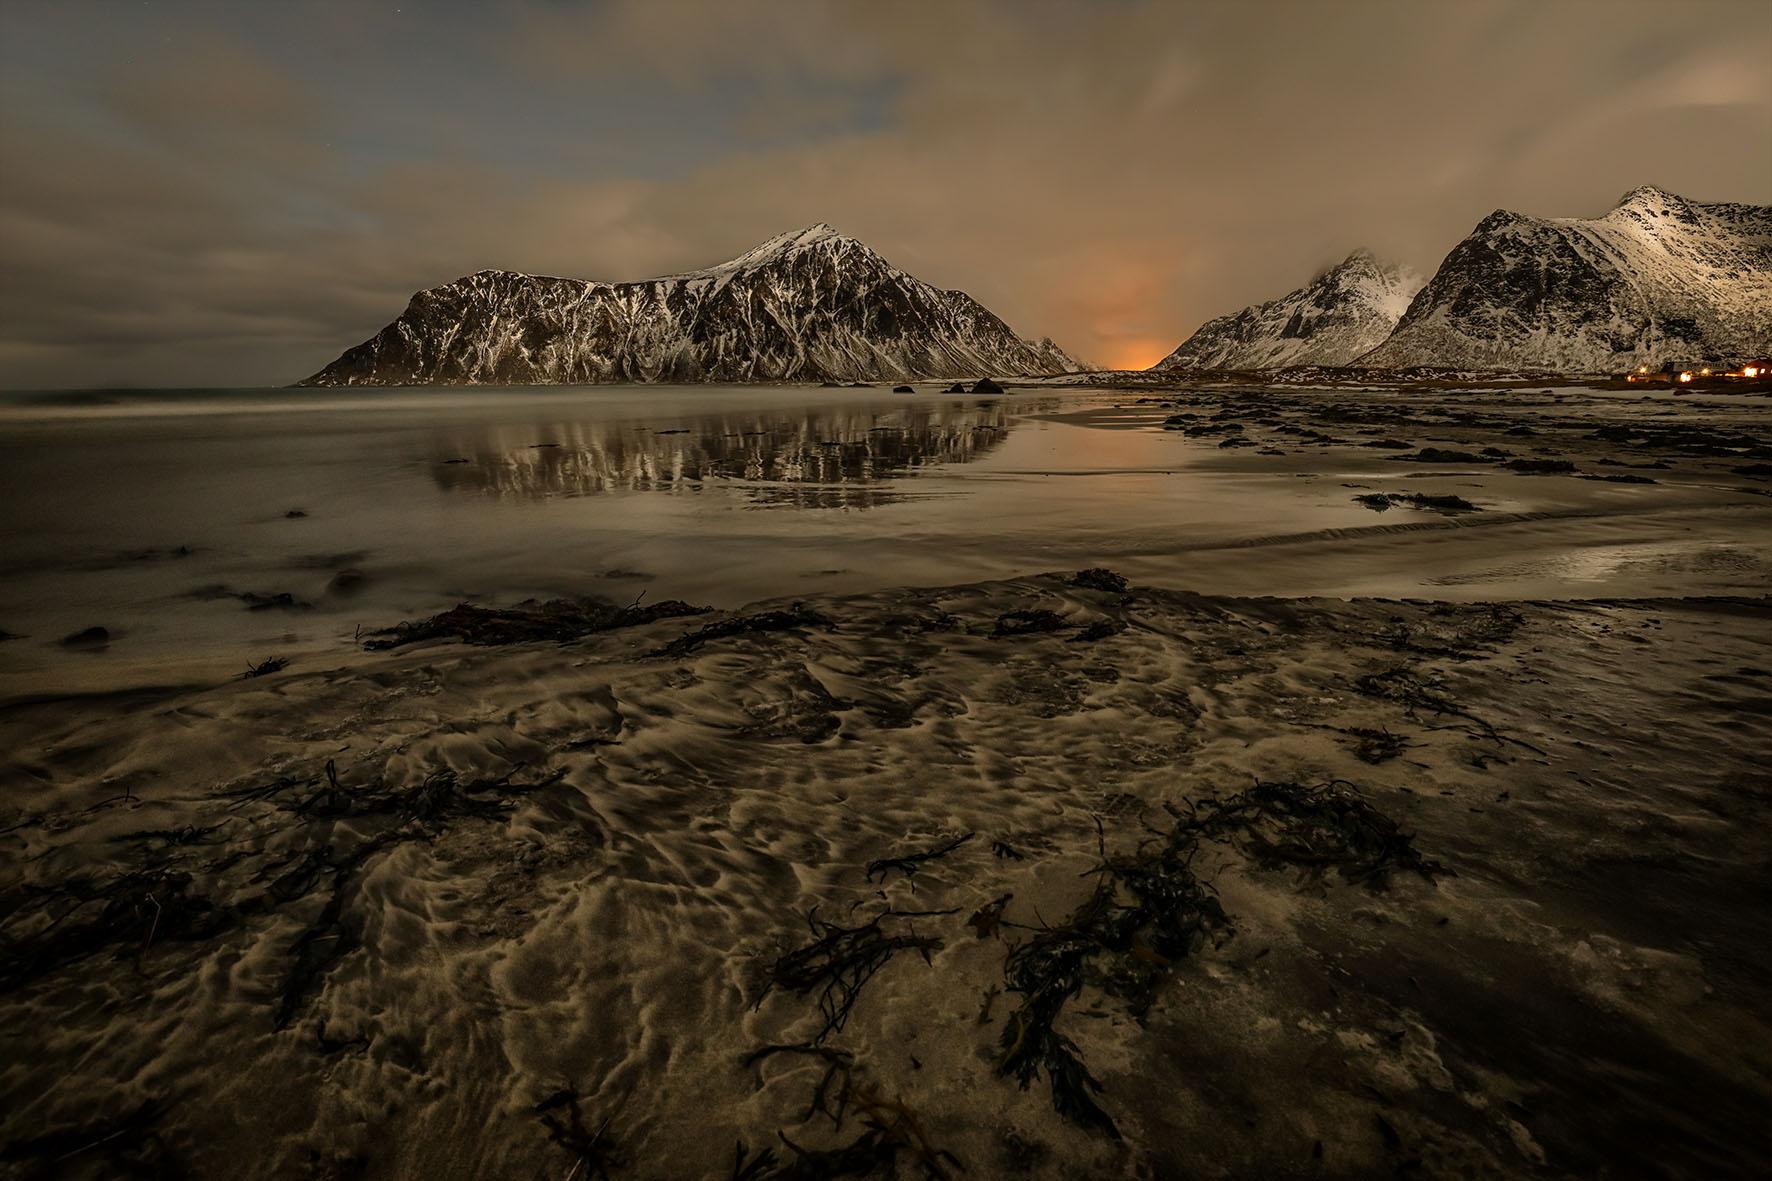 Норвежка Лунна Нощ | Author PCHELI  - PCHELI | PHOTO FORUM